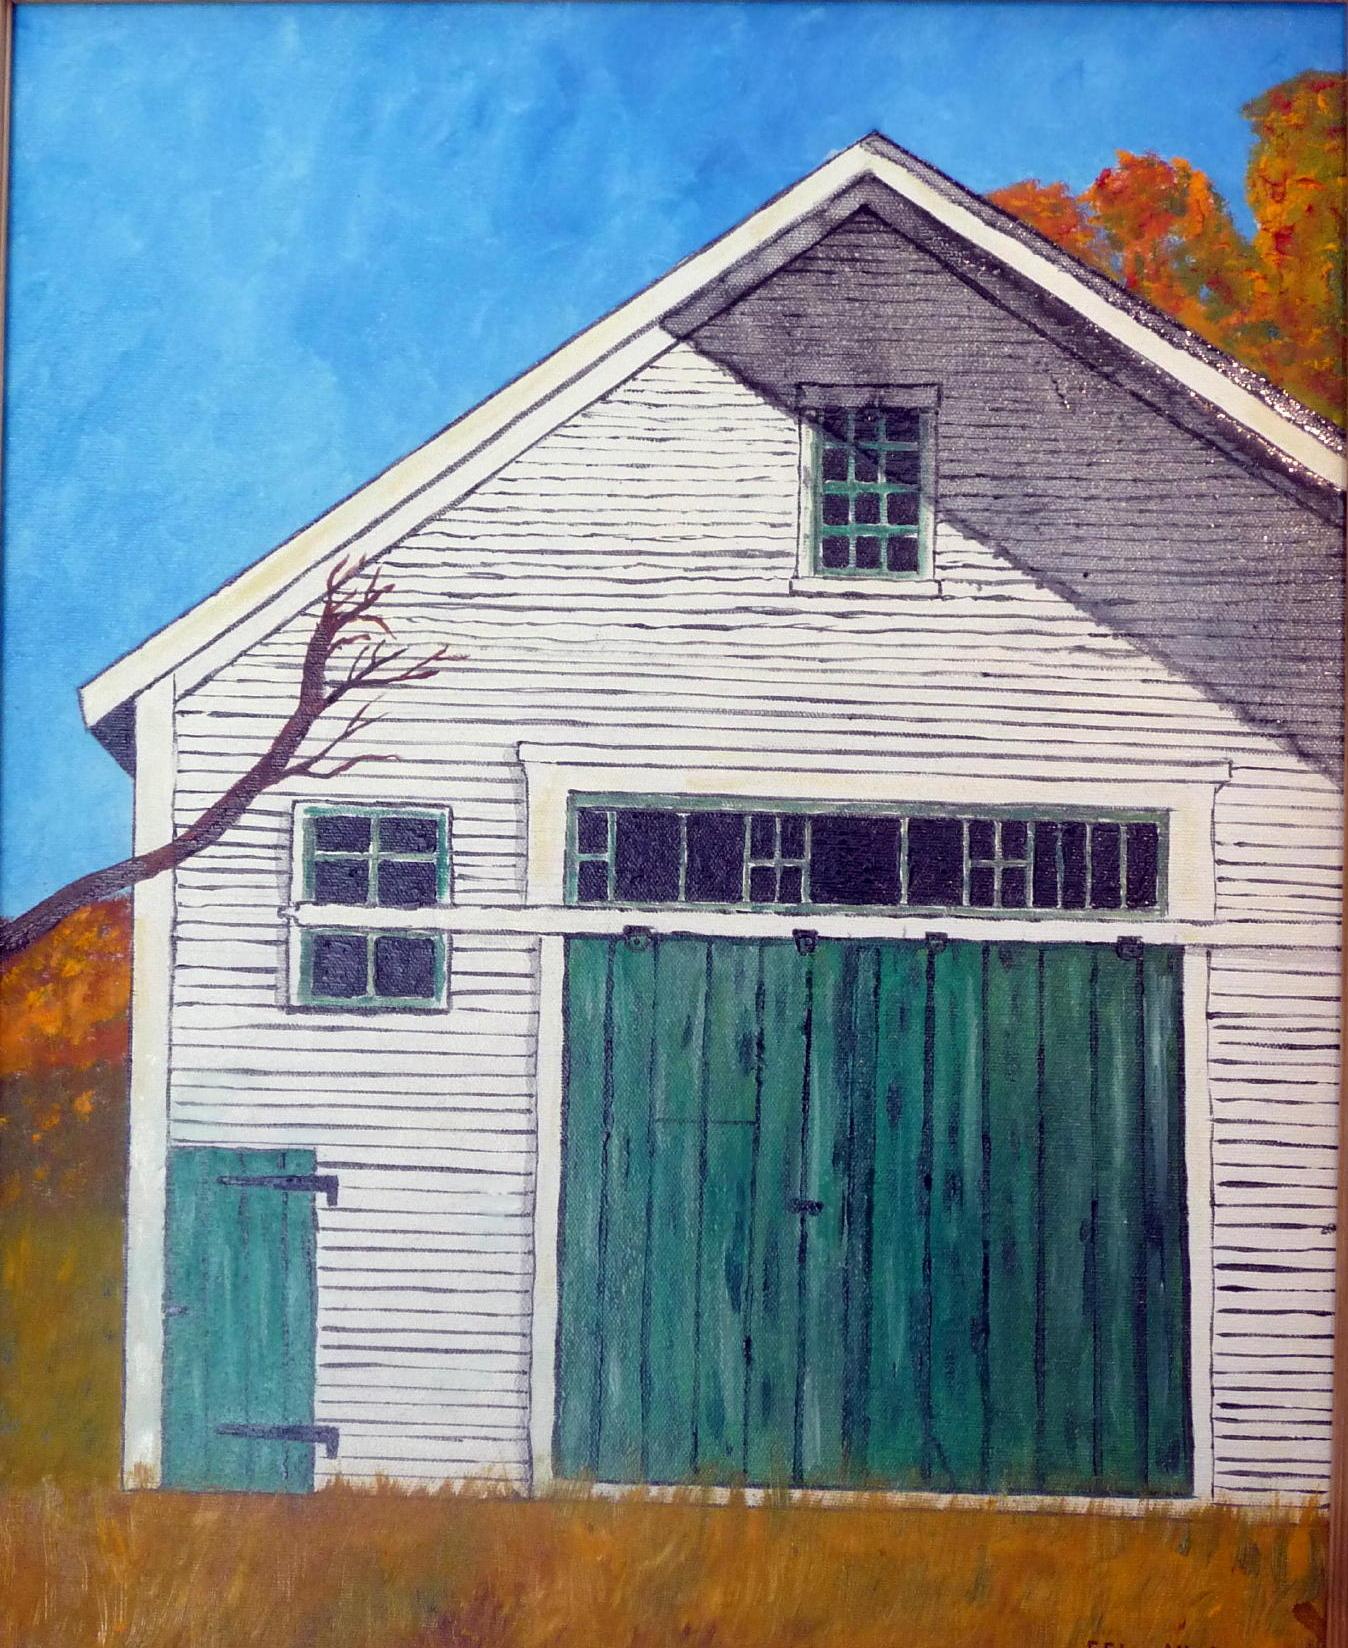 Beck's Barn